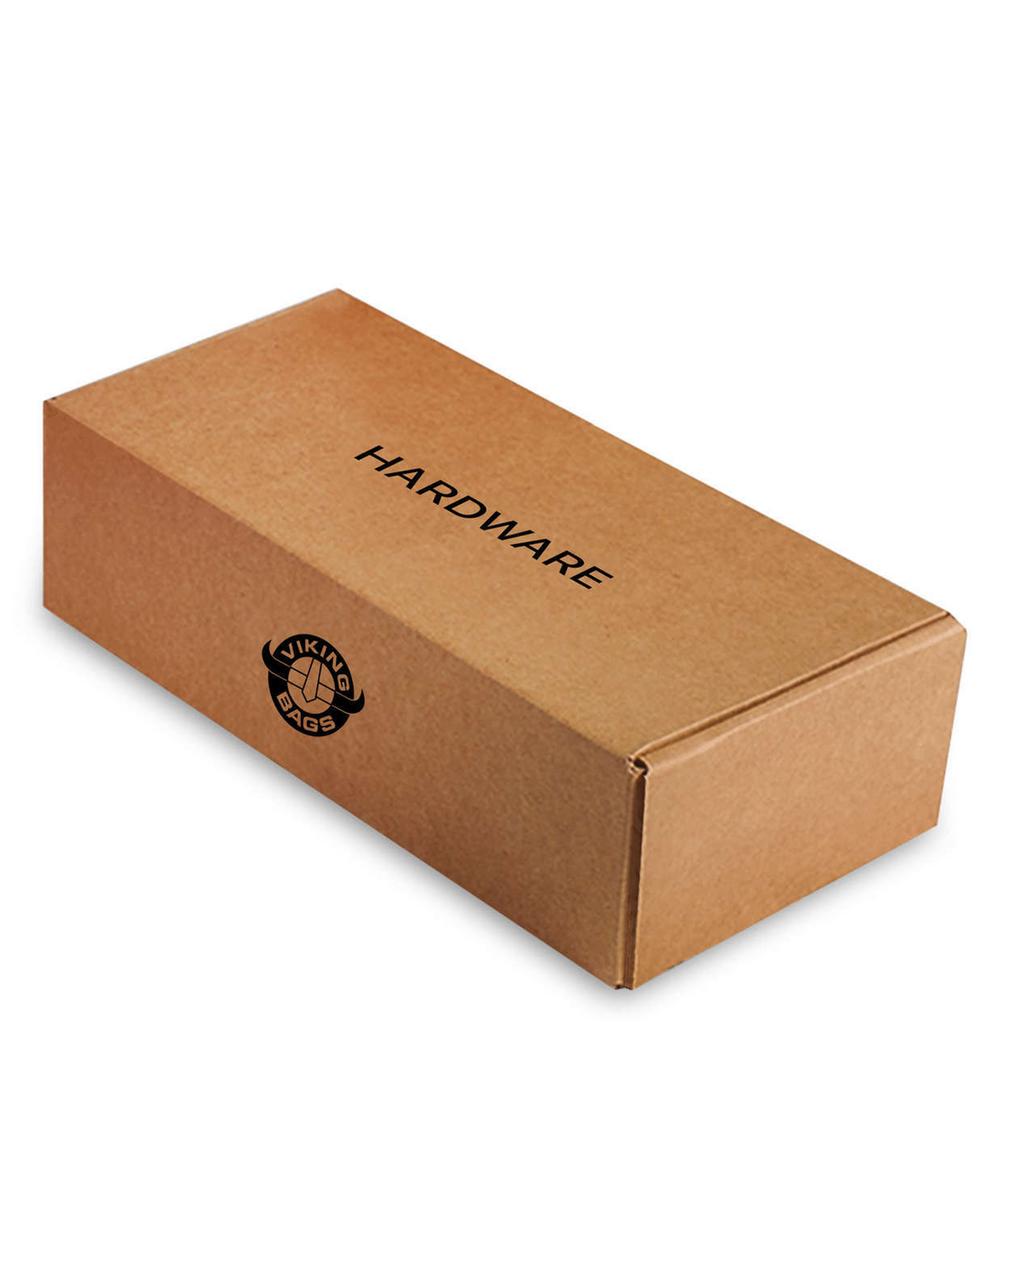 Triumph Rocket III Roadster Slanted Medium Studded Motorcycle Saddlebags Box